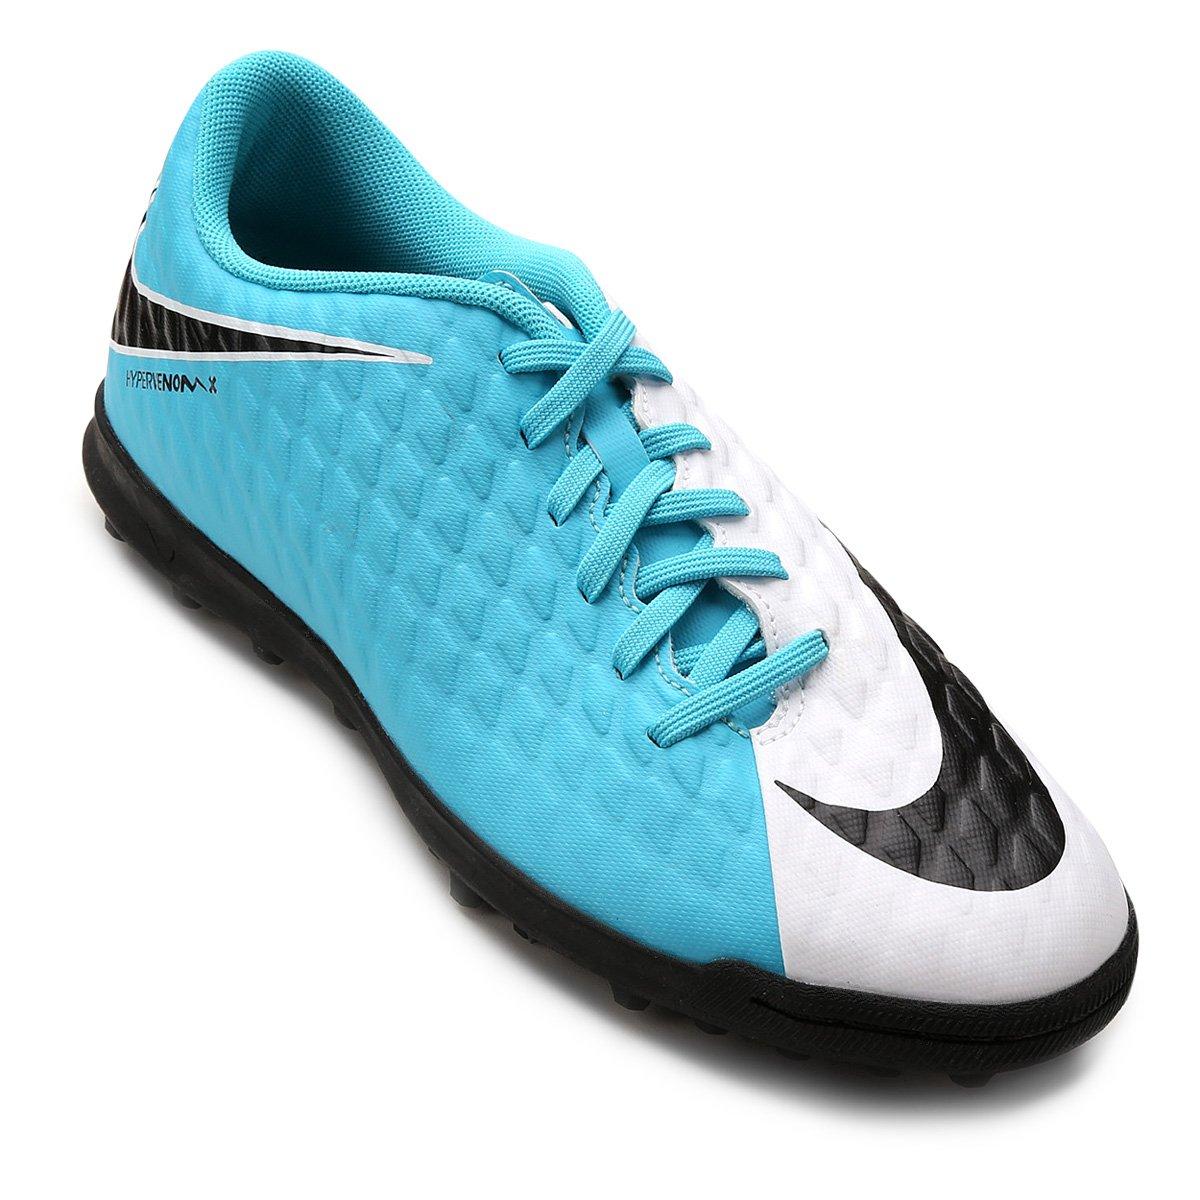 a363e42a39ca7 Chuteira Society Nike Hypervenom Phade 3 - Compre Agora